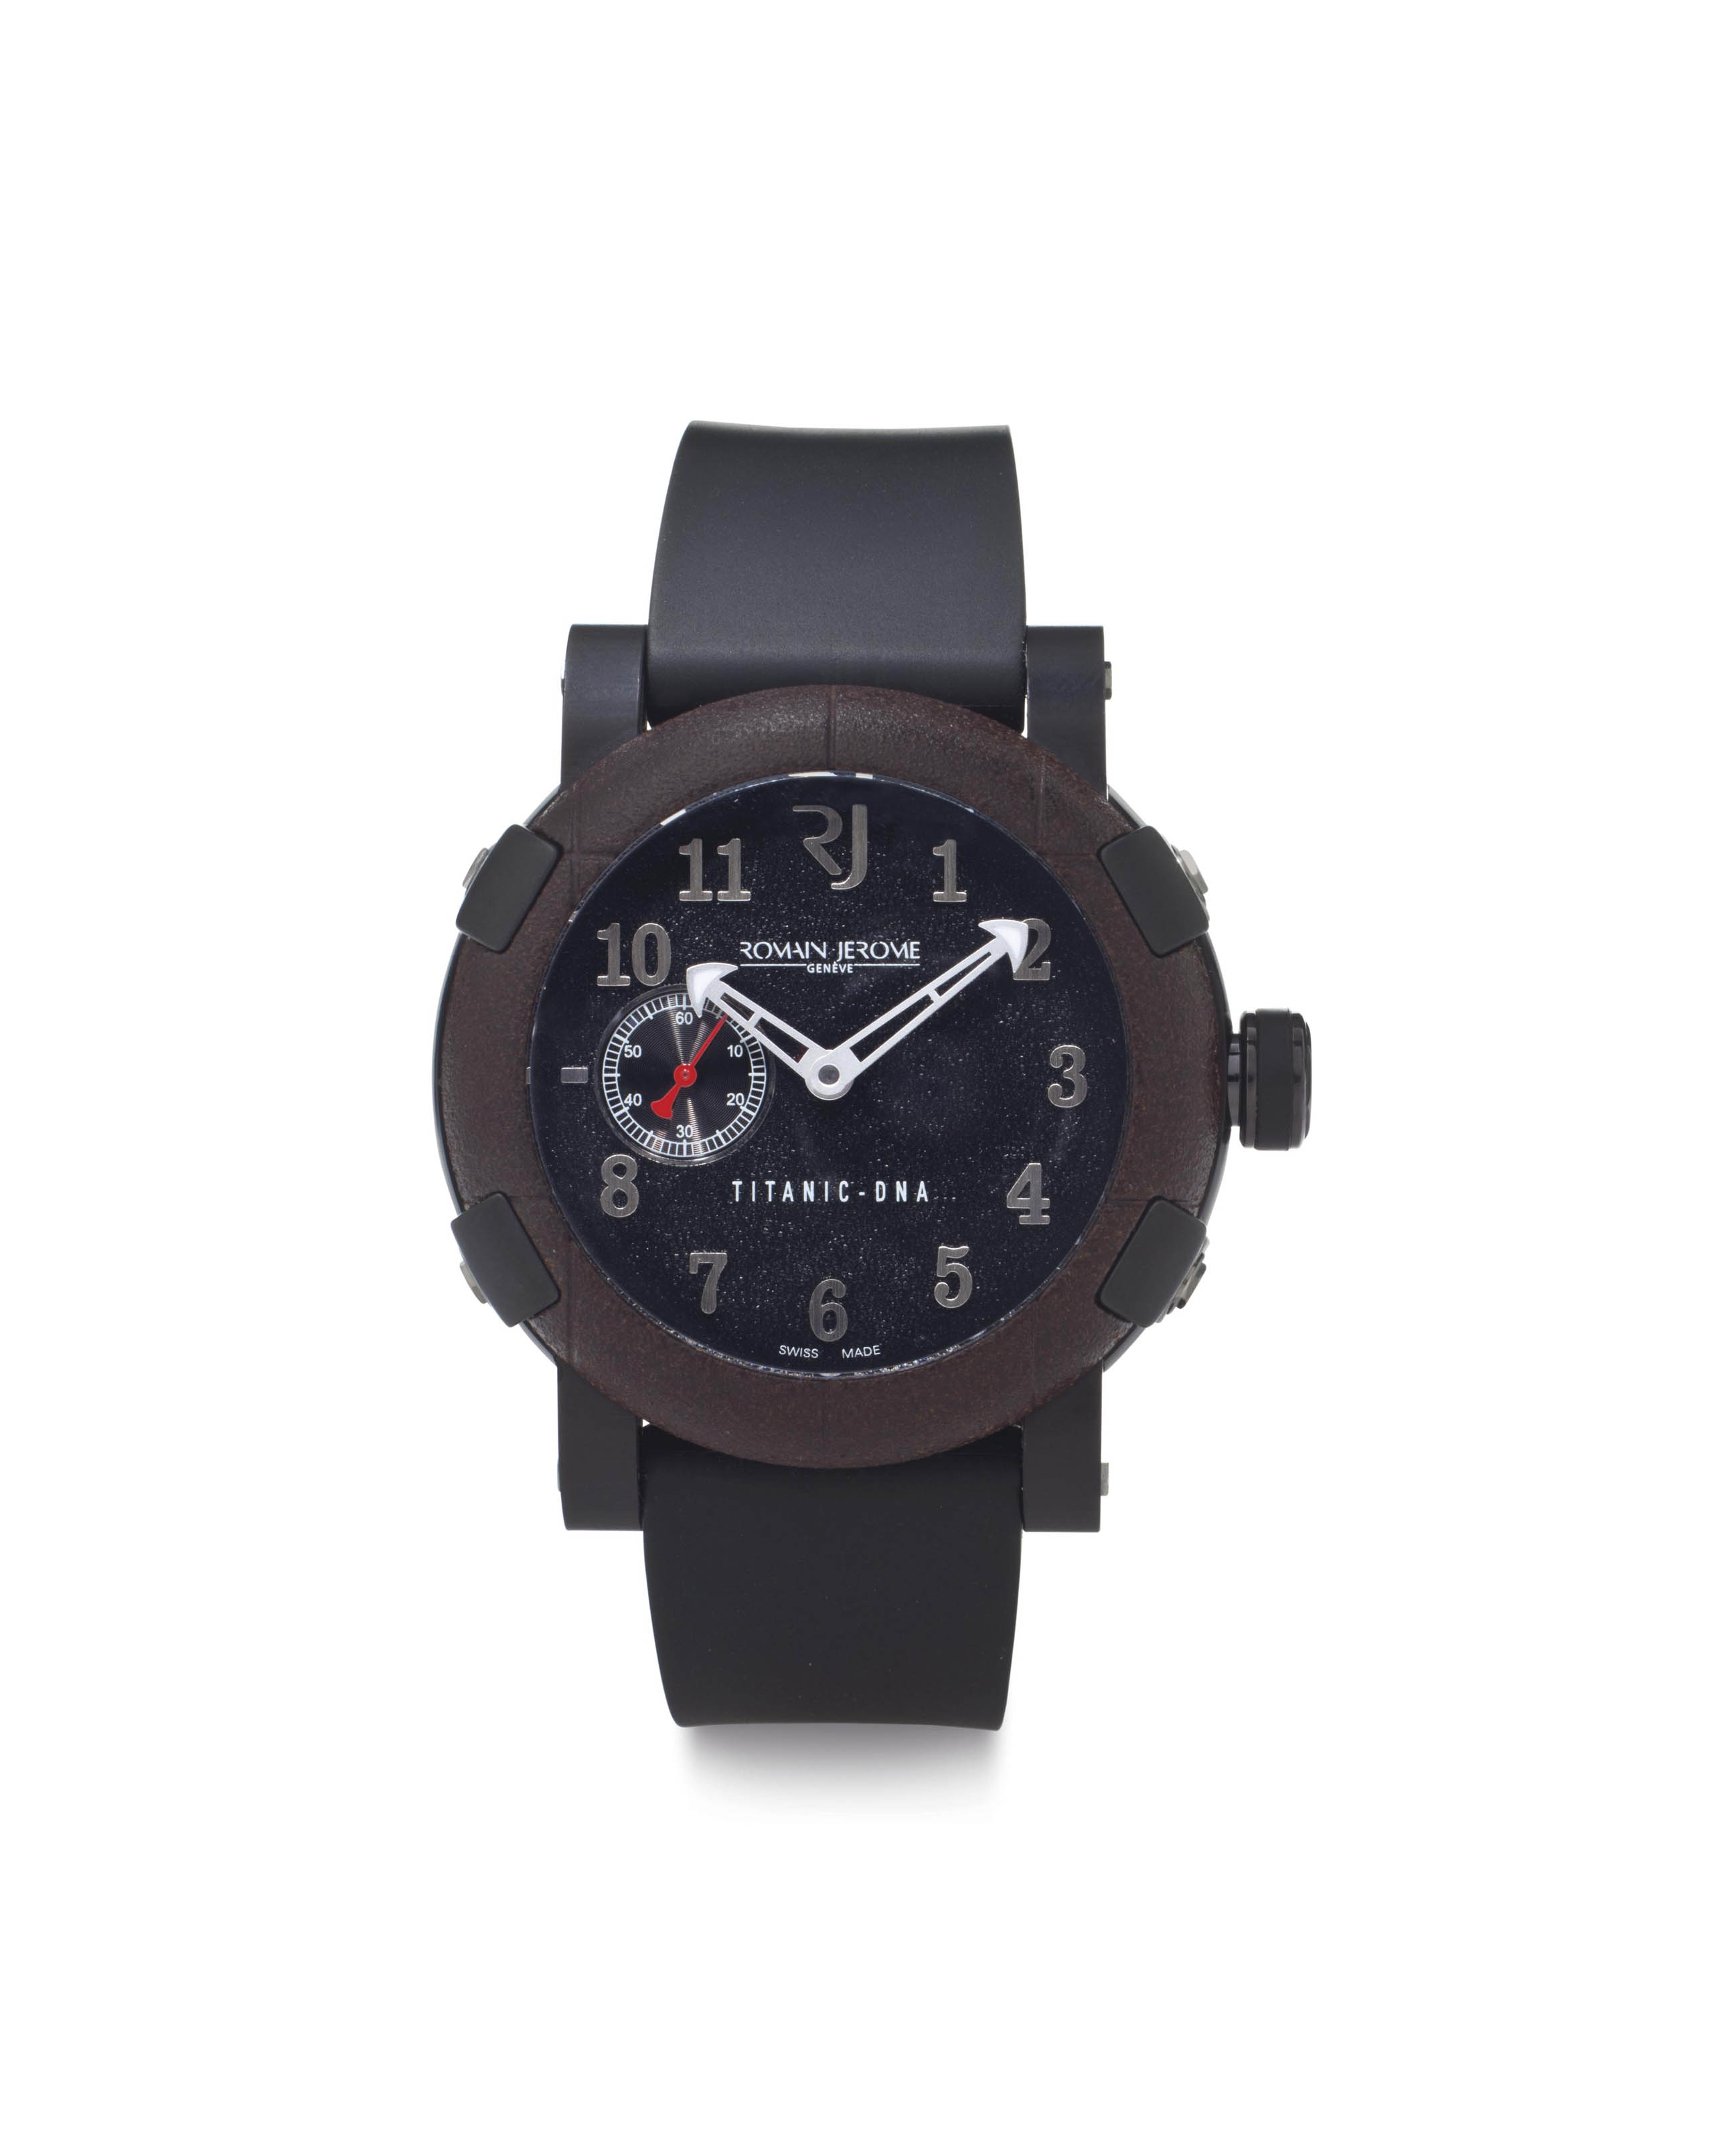 Romain Jerome. A Limited Edition Titanic DNA Black Oxidized Steel Wristwatch